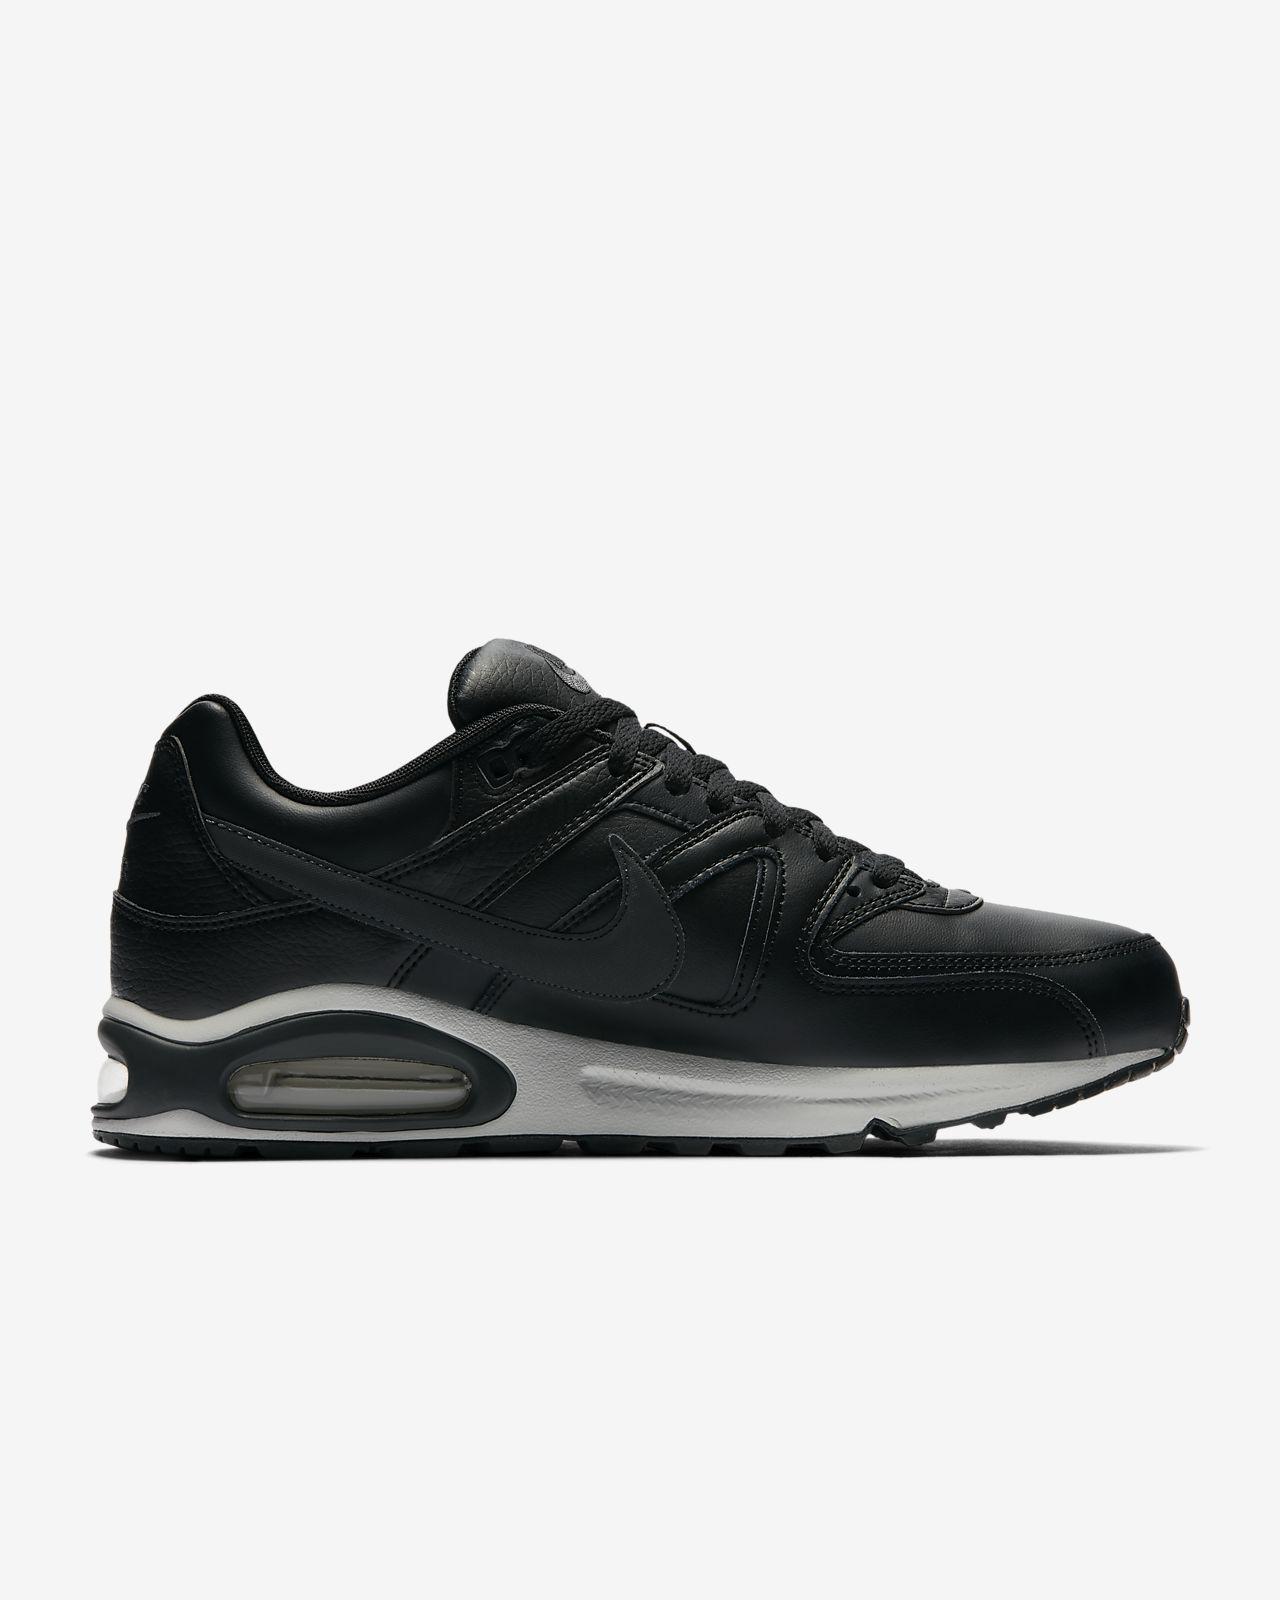 det bedste Livsstil Sko Herre Nike Air Max 90 Essential